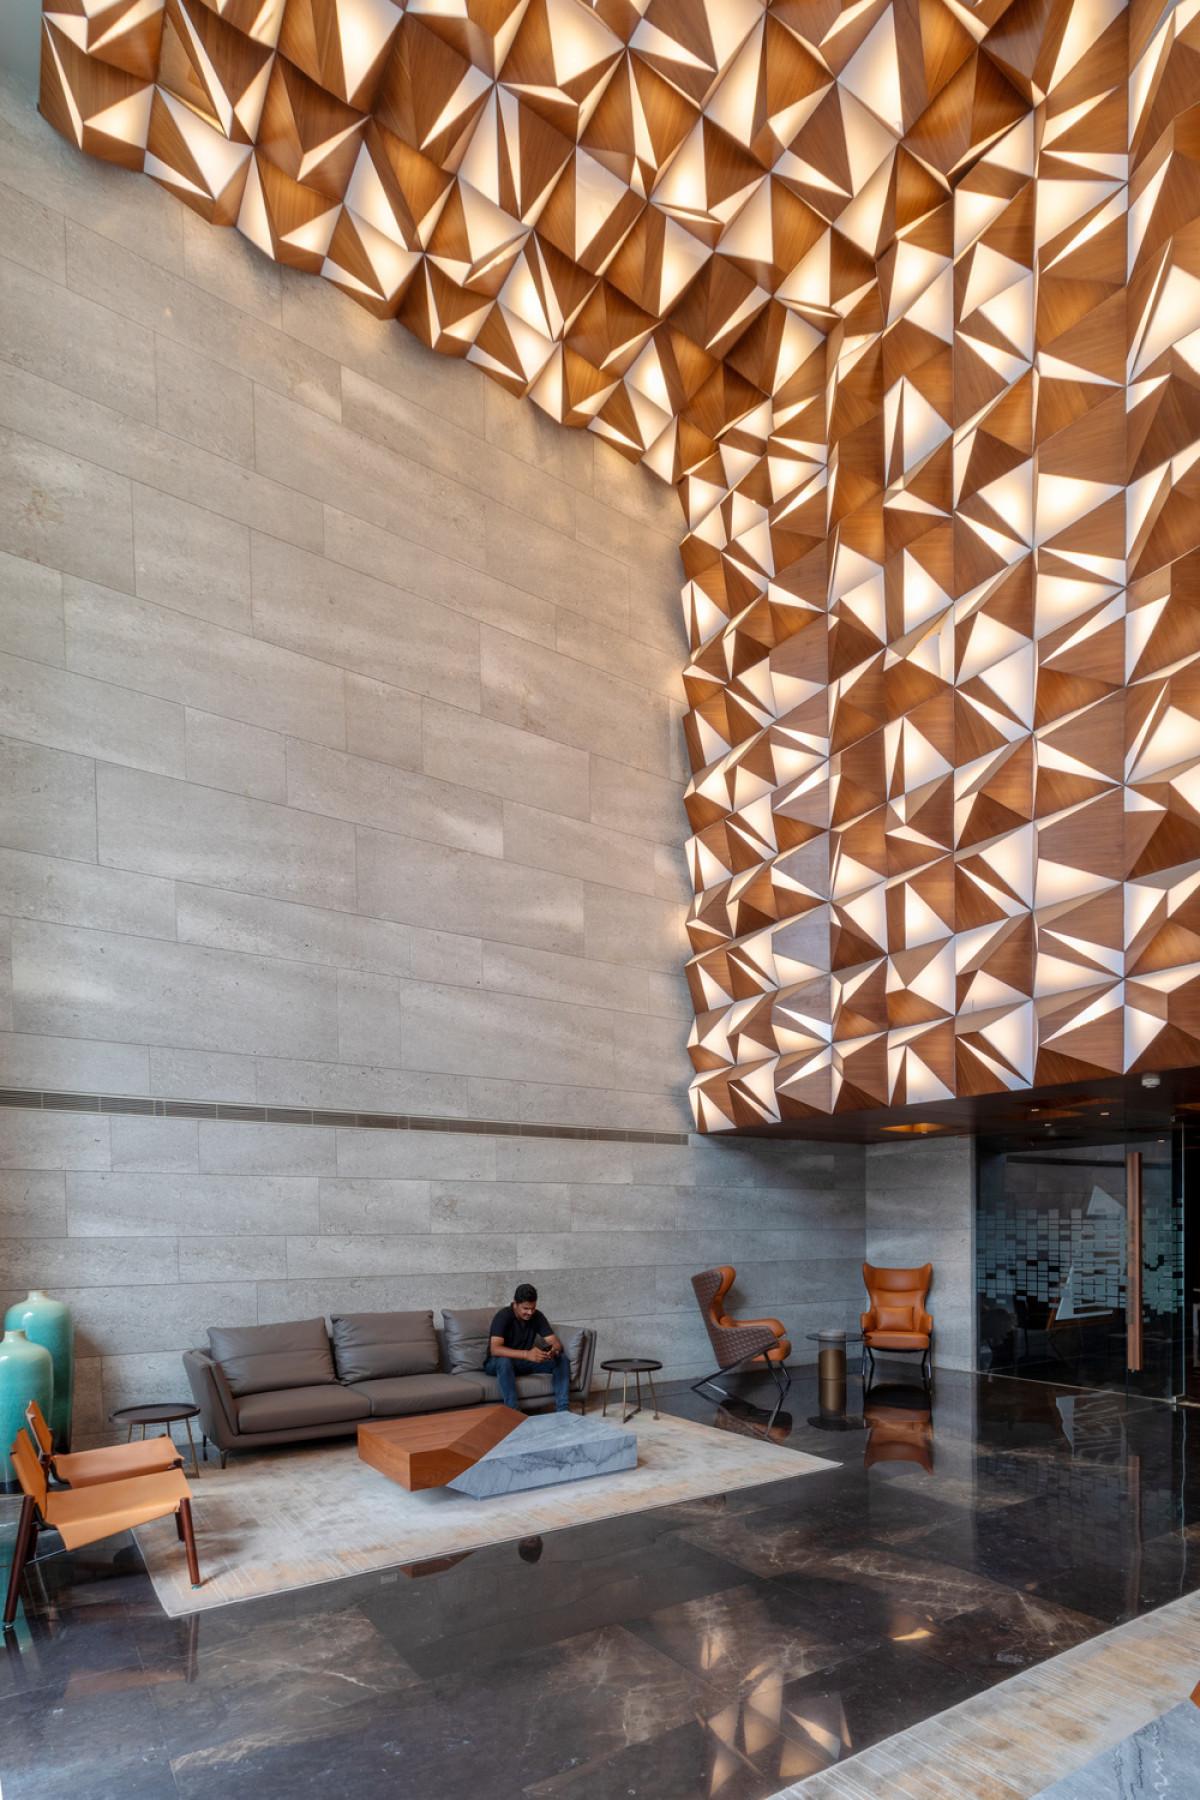 Each building is entered through a sculptural lobby